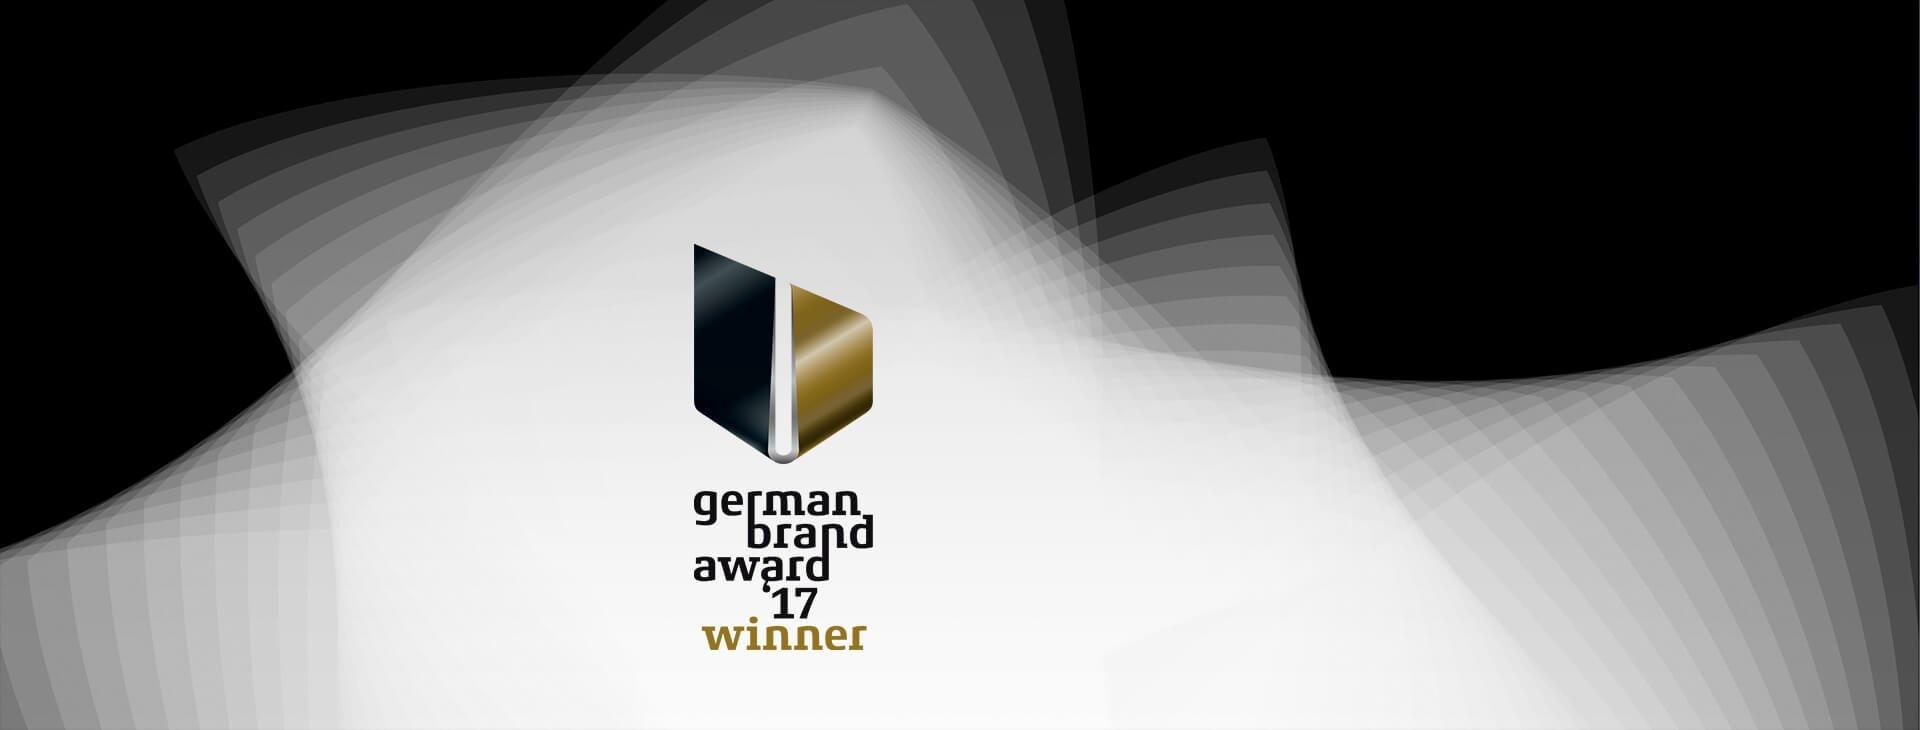 stilwerk_german_brand_award_2017_stage